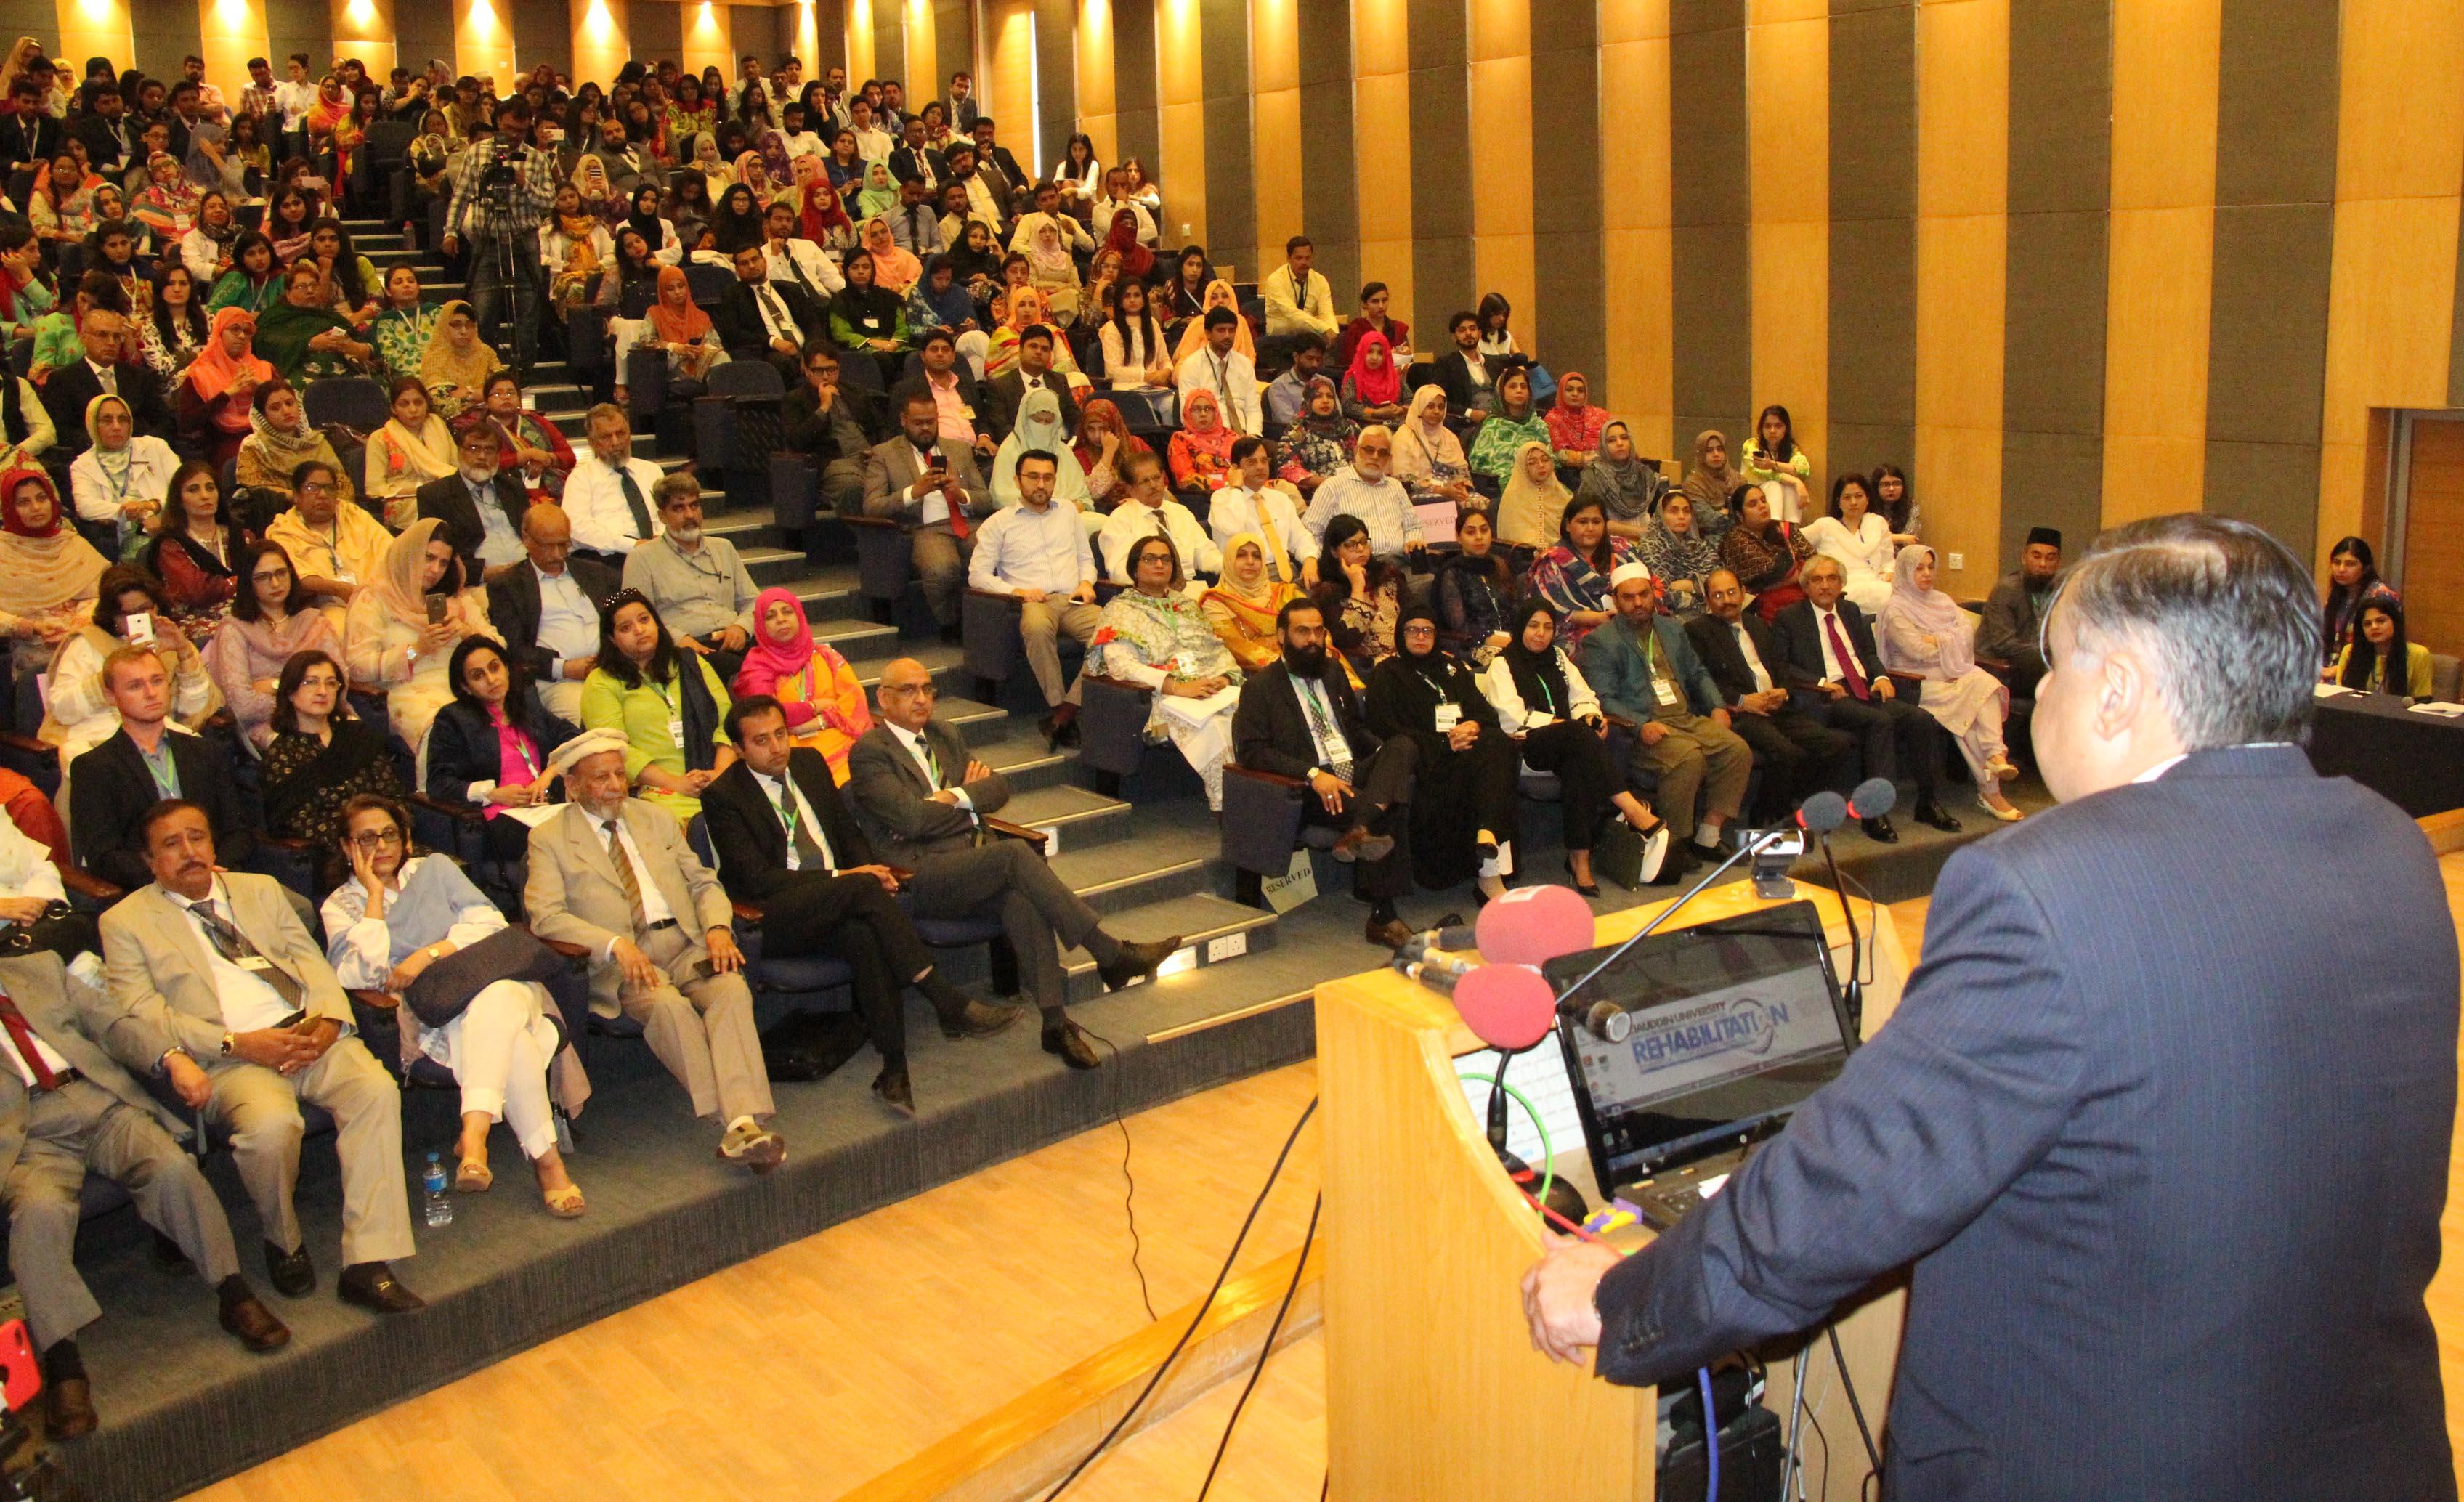 photo courtesy ziauddin university